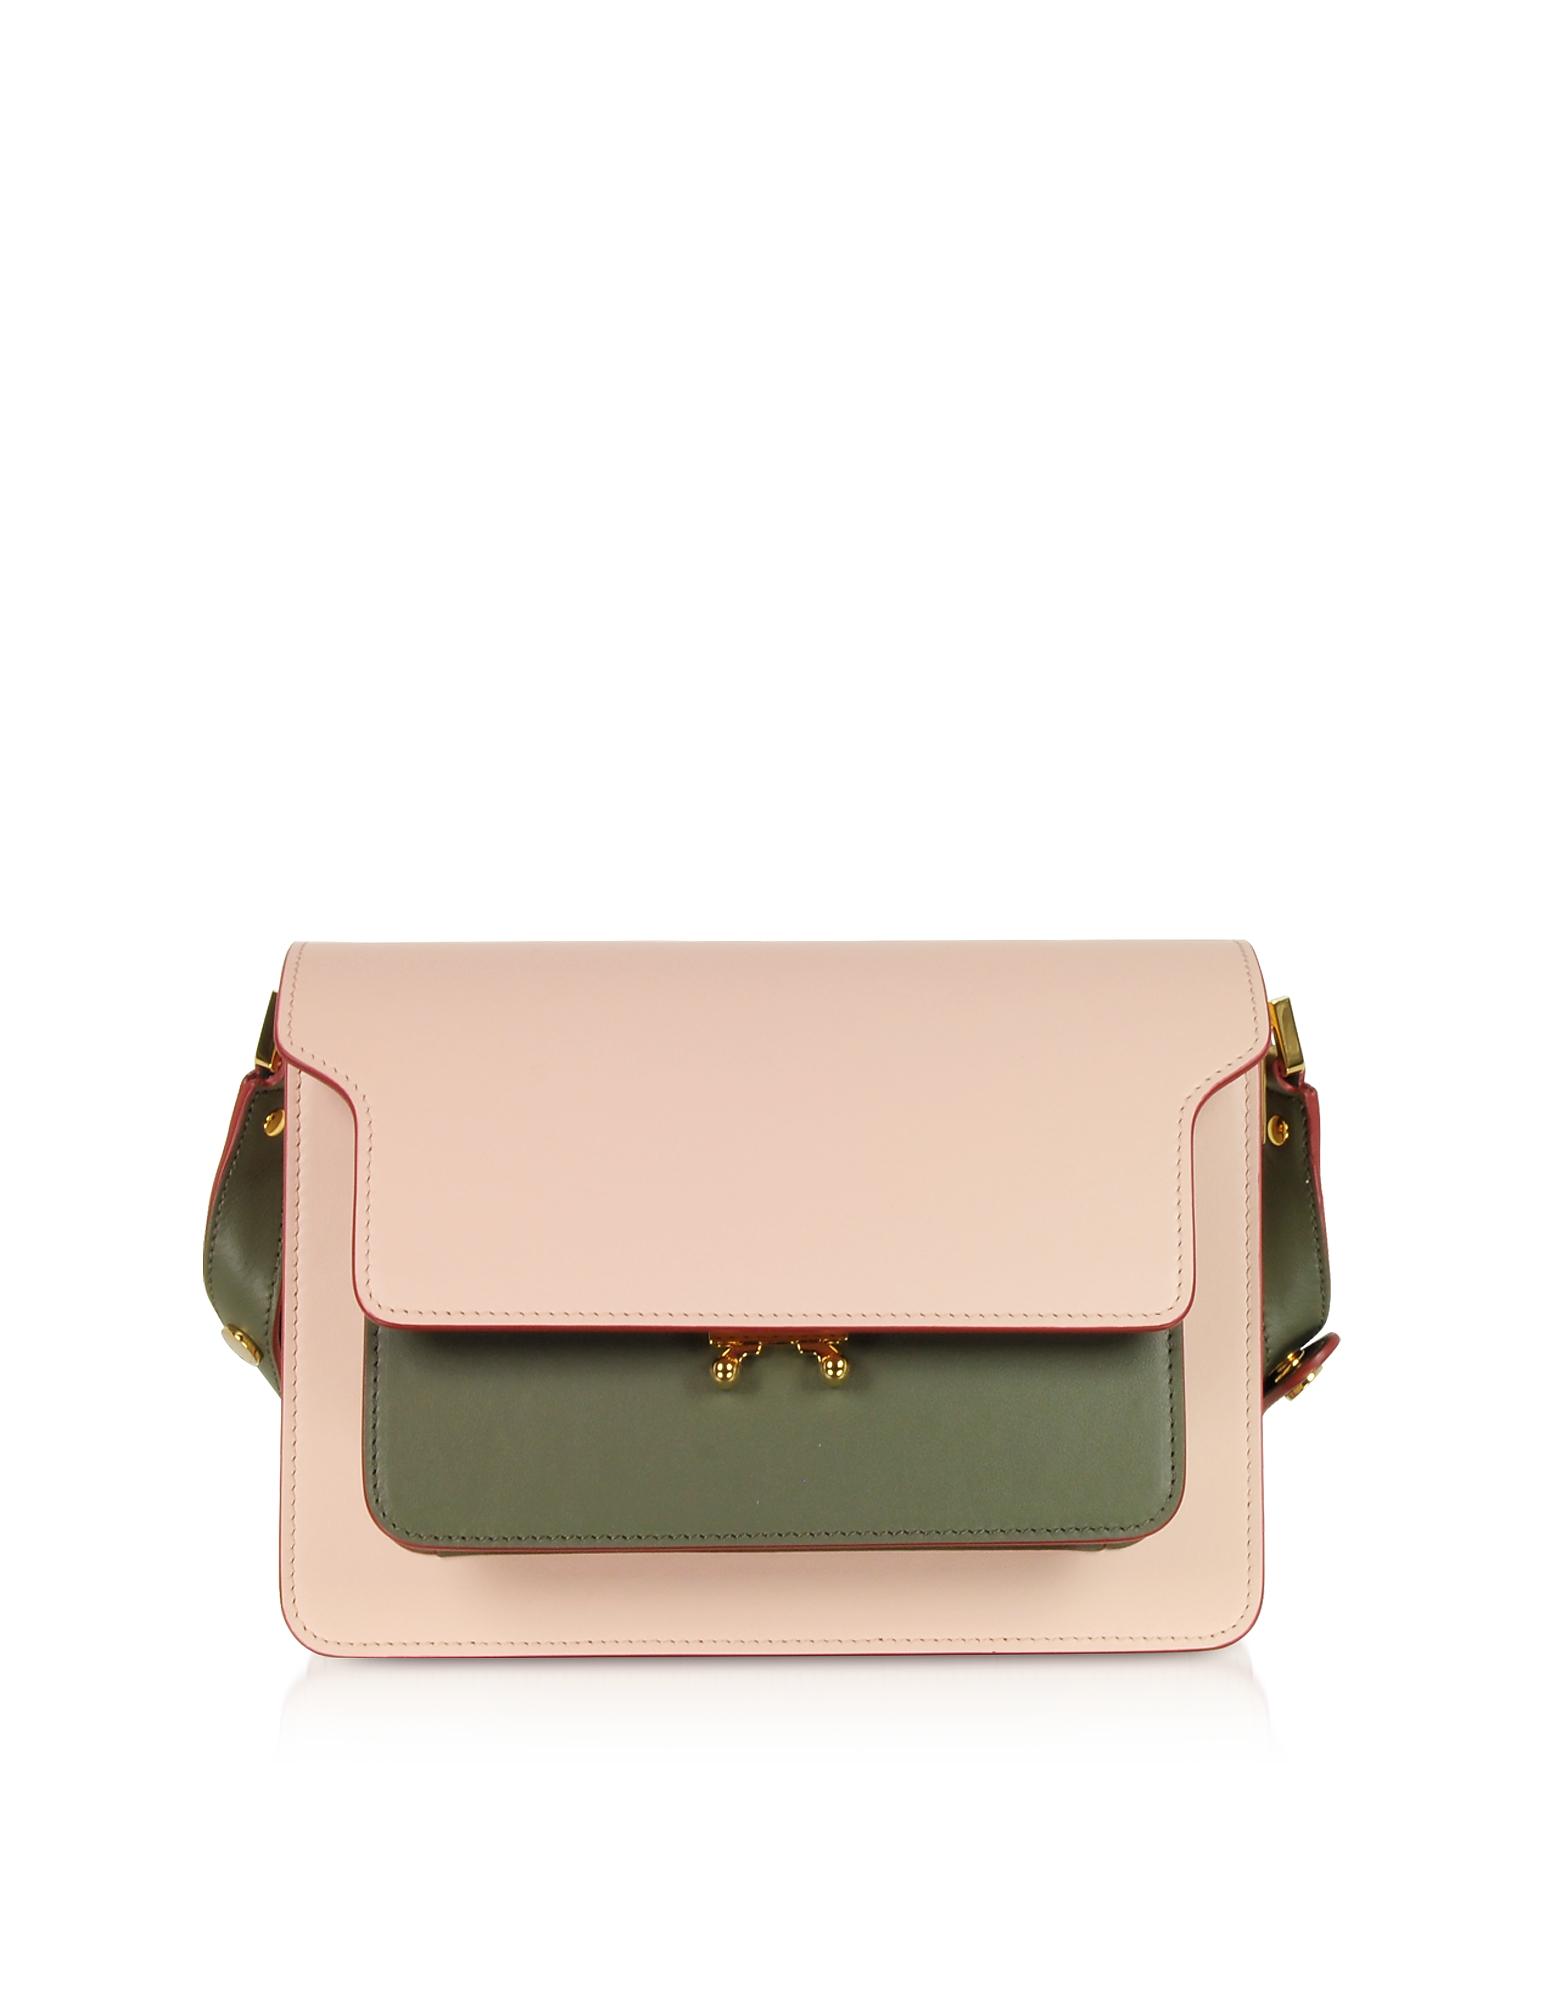 Marni Designer Handbags, Color Block Leather Mini Trunk Bag